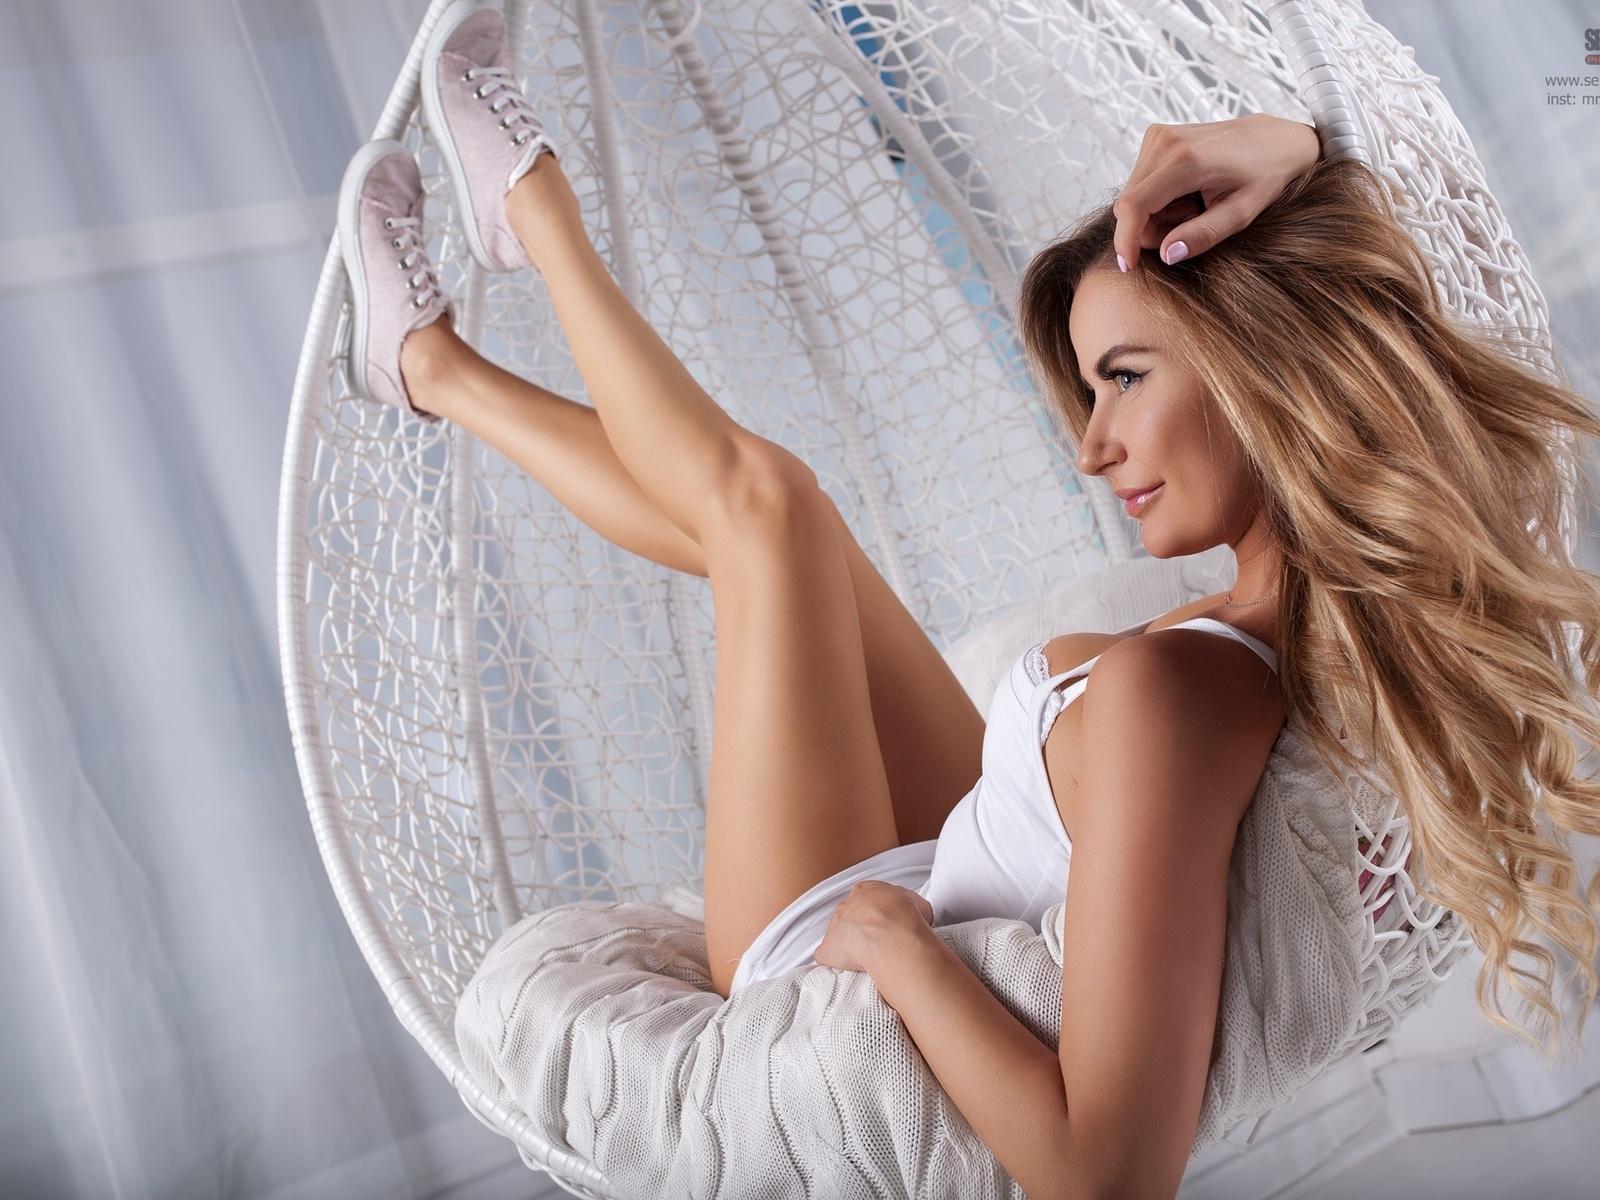 women, blonde, sergey pak, smiling, sneakers, brunette, white dress, women indoors, hammock chair, pink nails